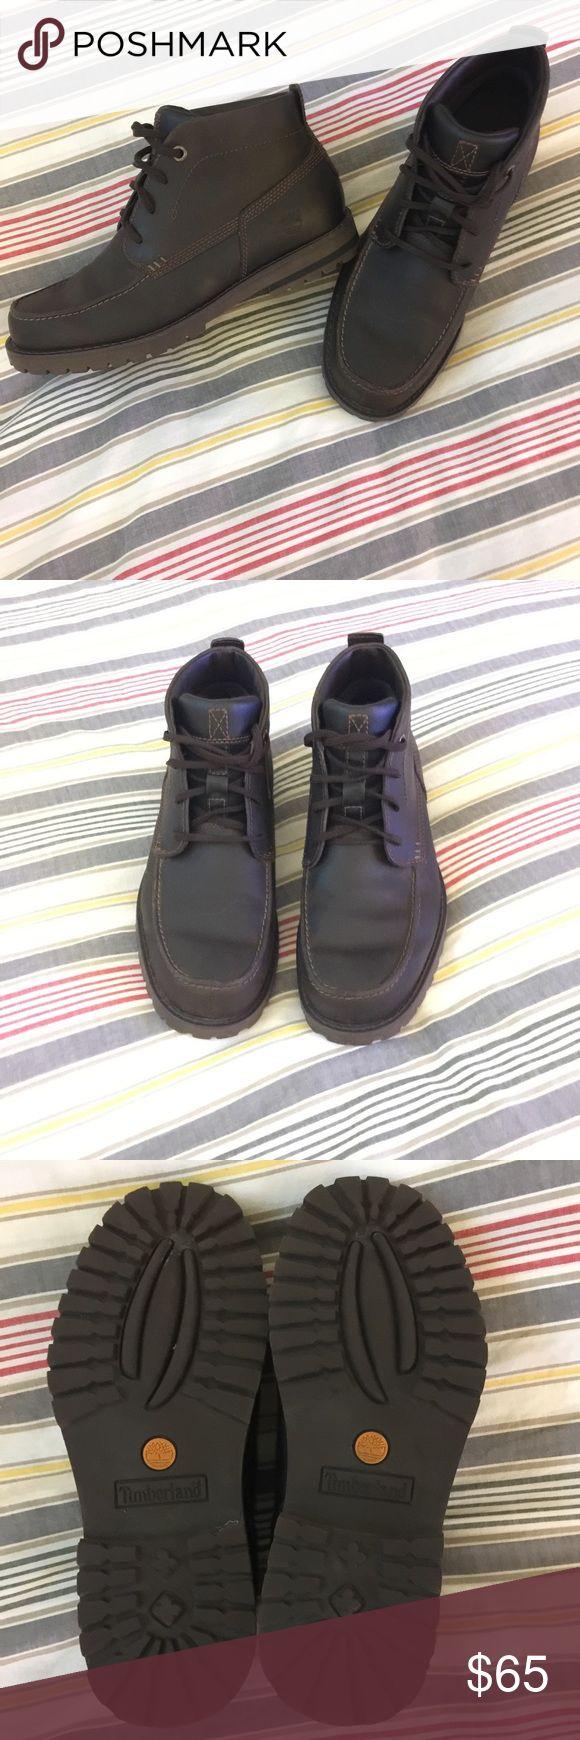 Timberland Baluster Chukka's EUC. Dark Brown Timberland Chukka Boots. Only worn maybe two times. Timberland Shoes Chukka Boots